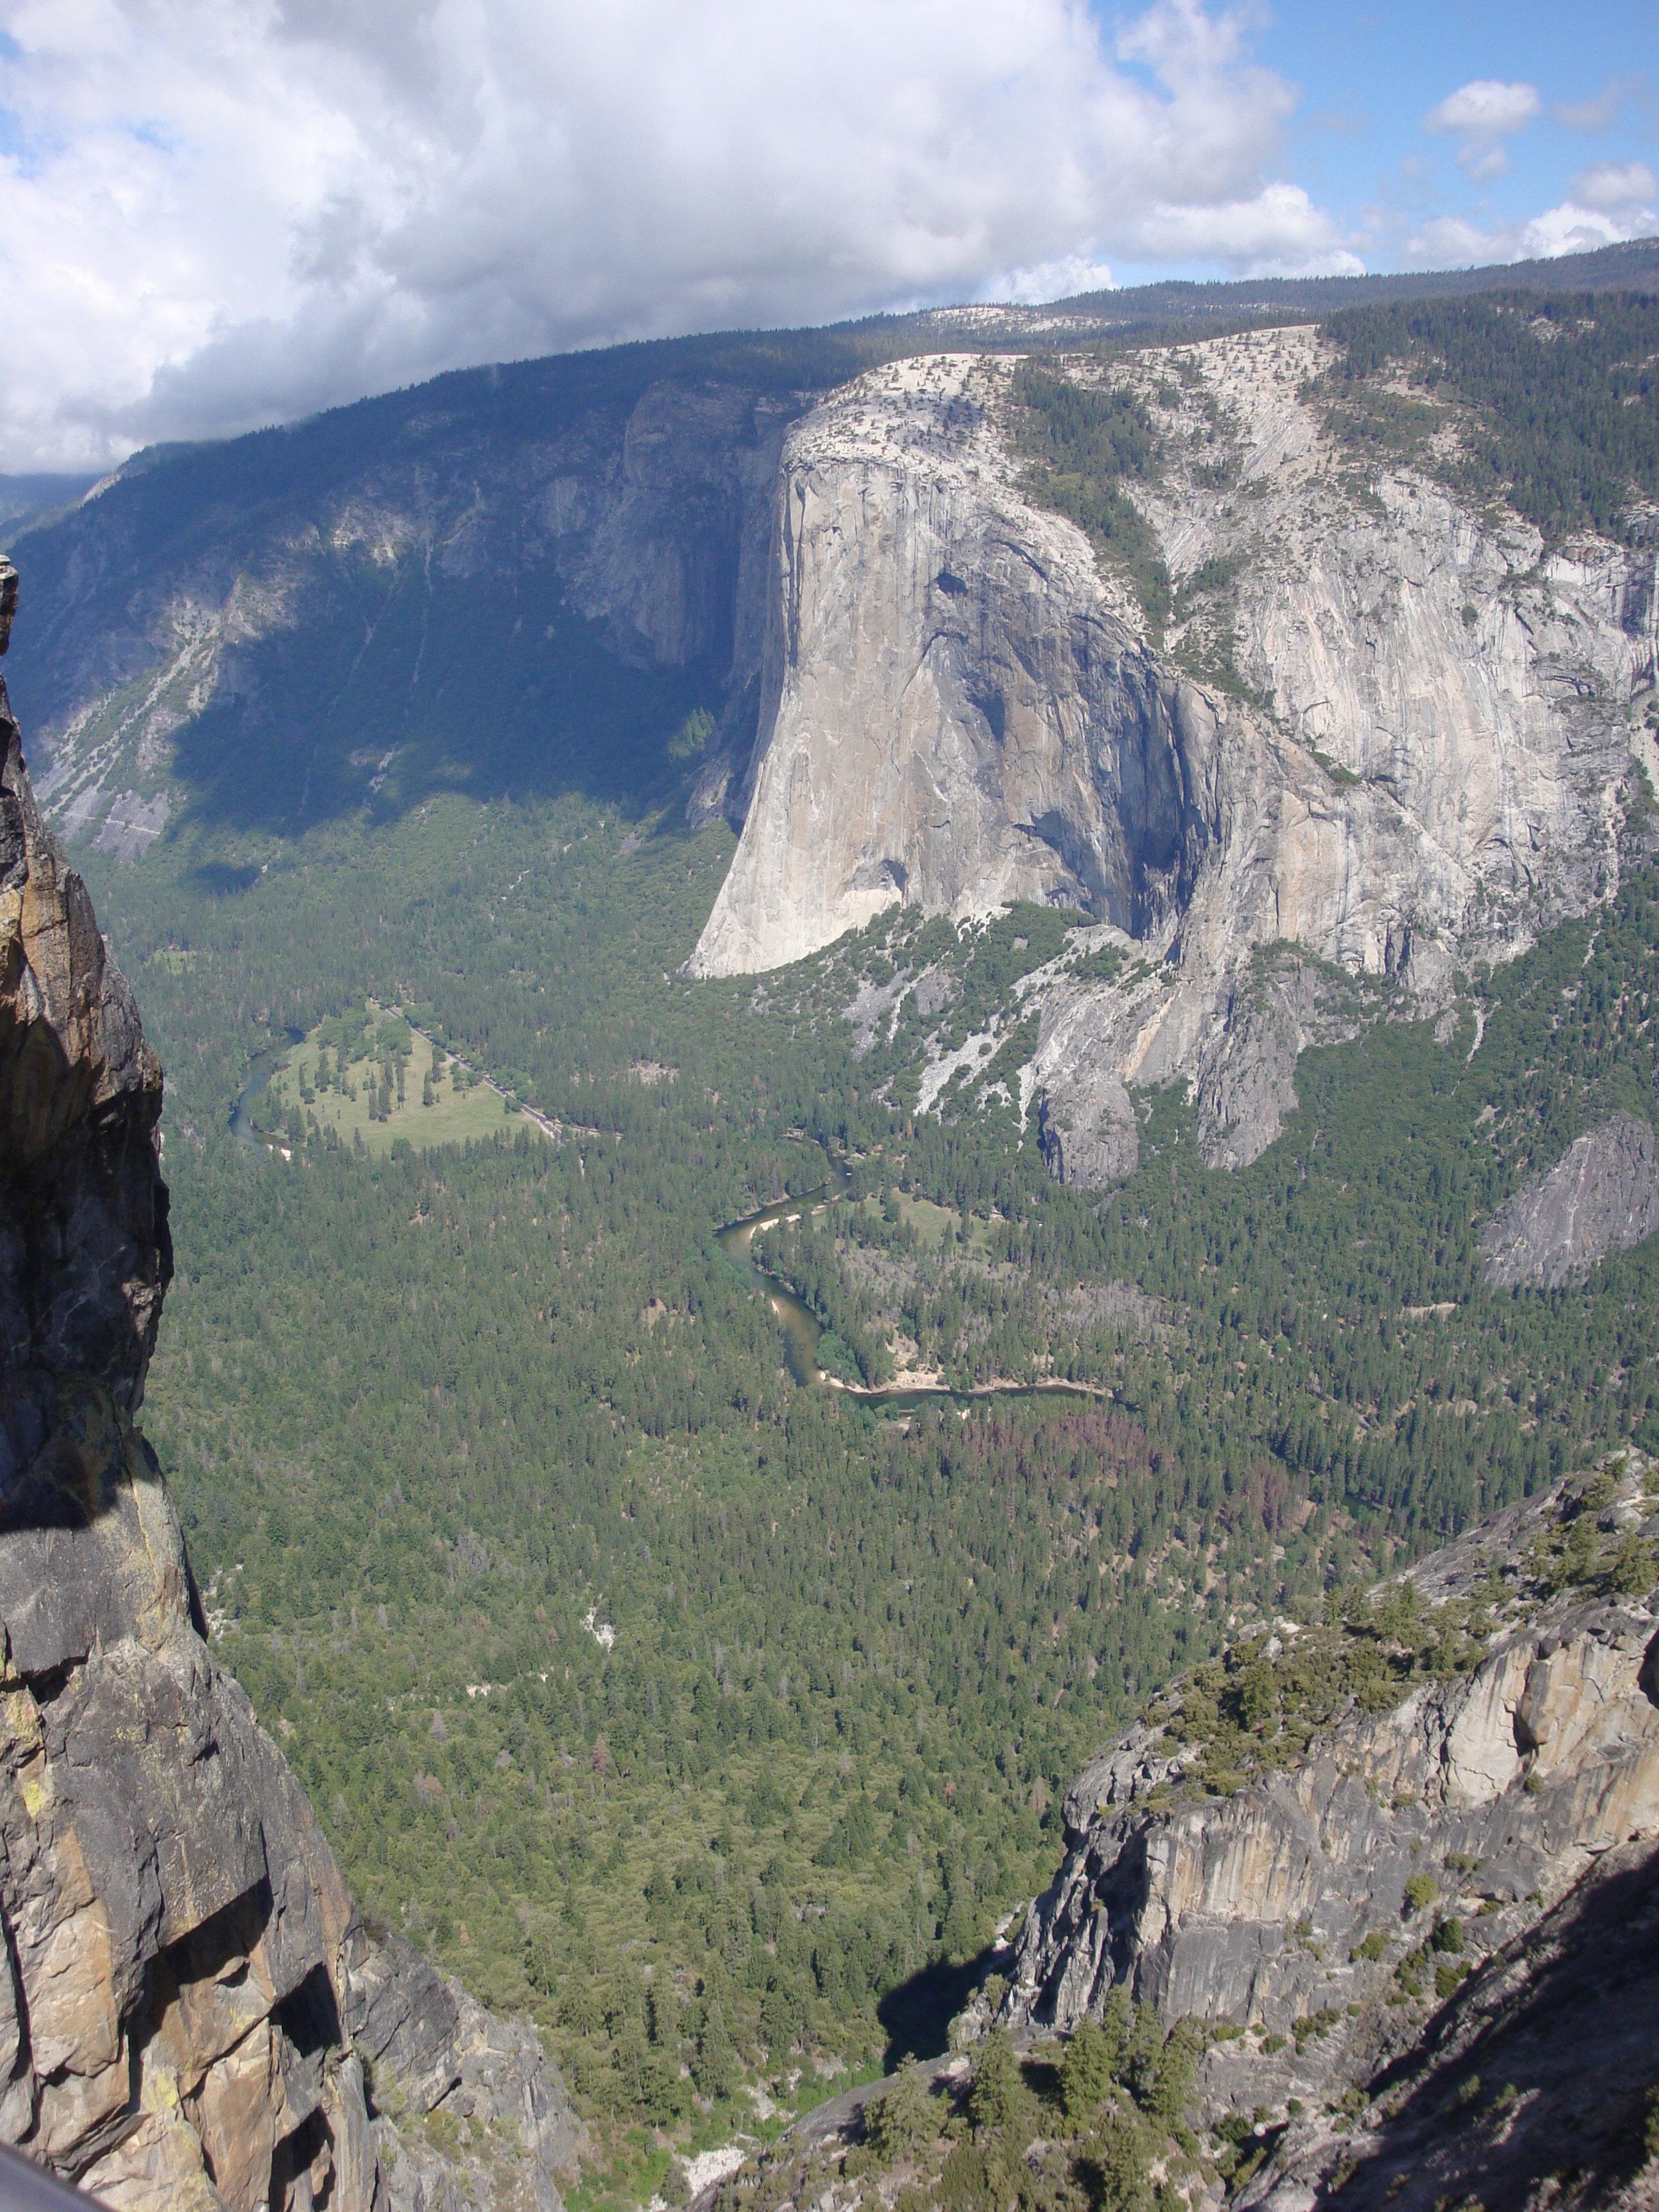 El Capitan - June 2008 - As viewed from Taft Point.